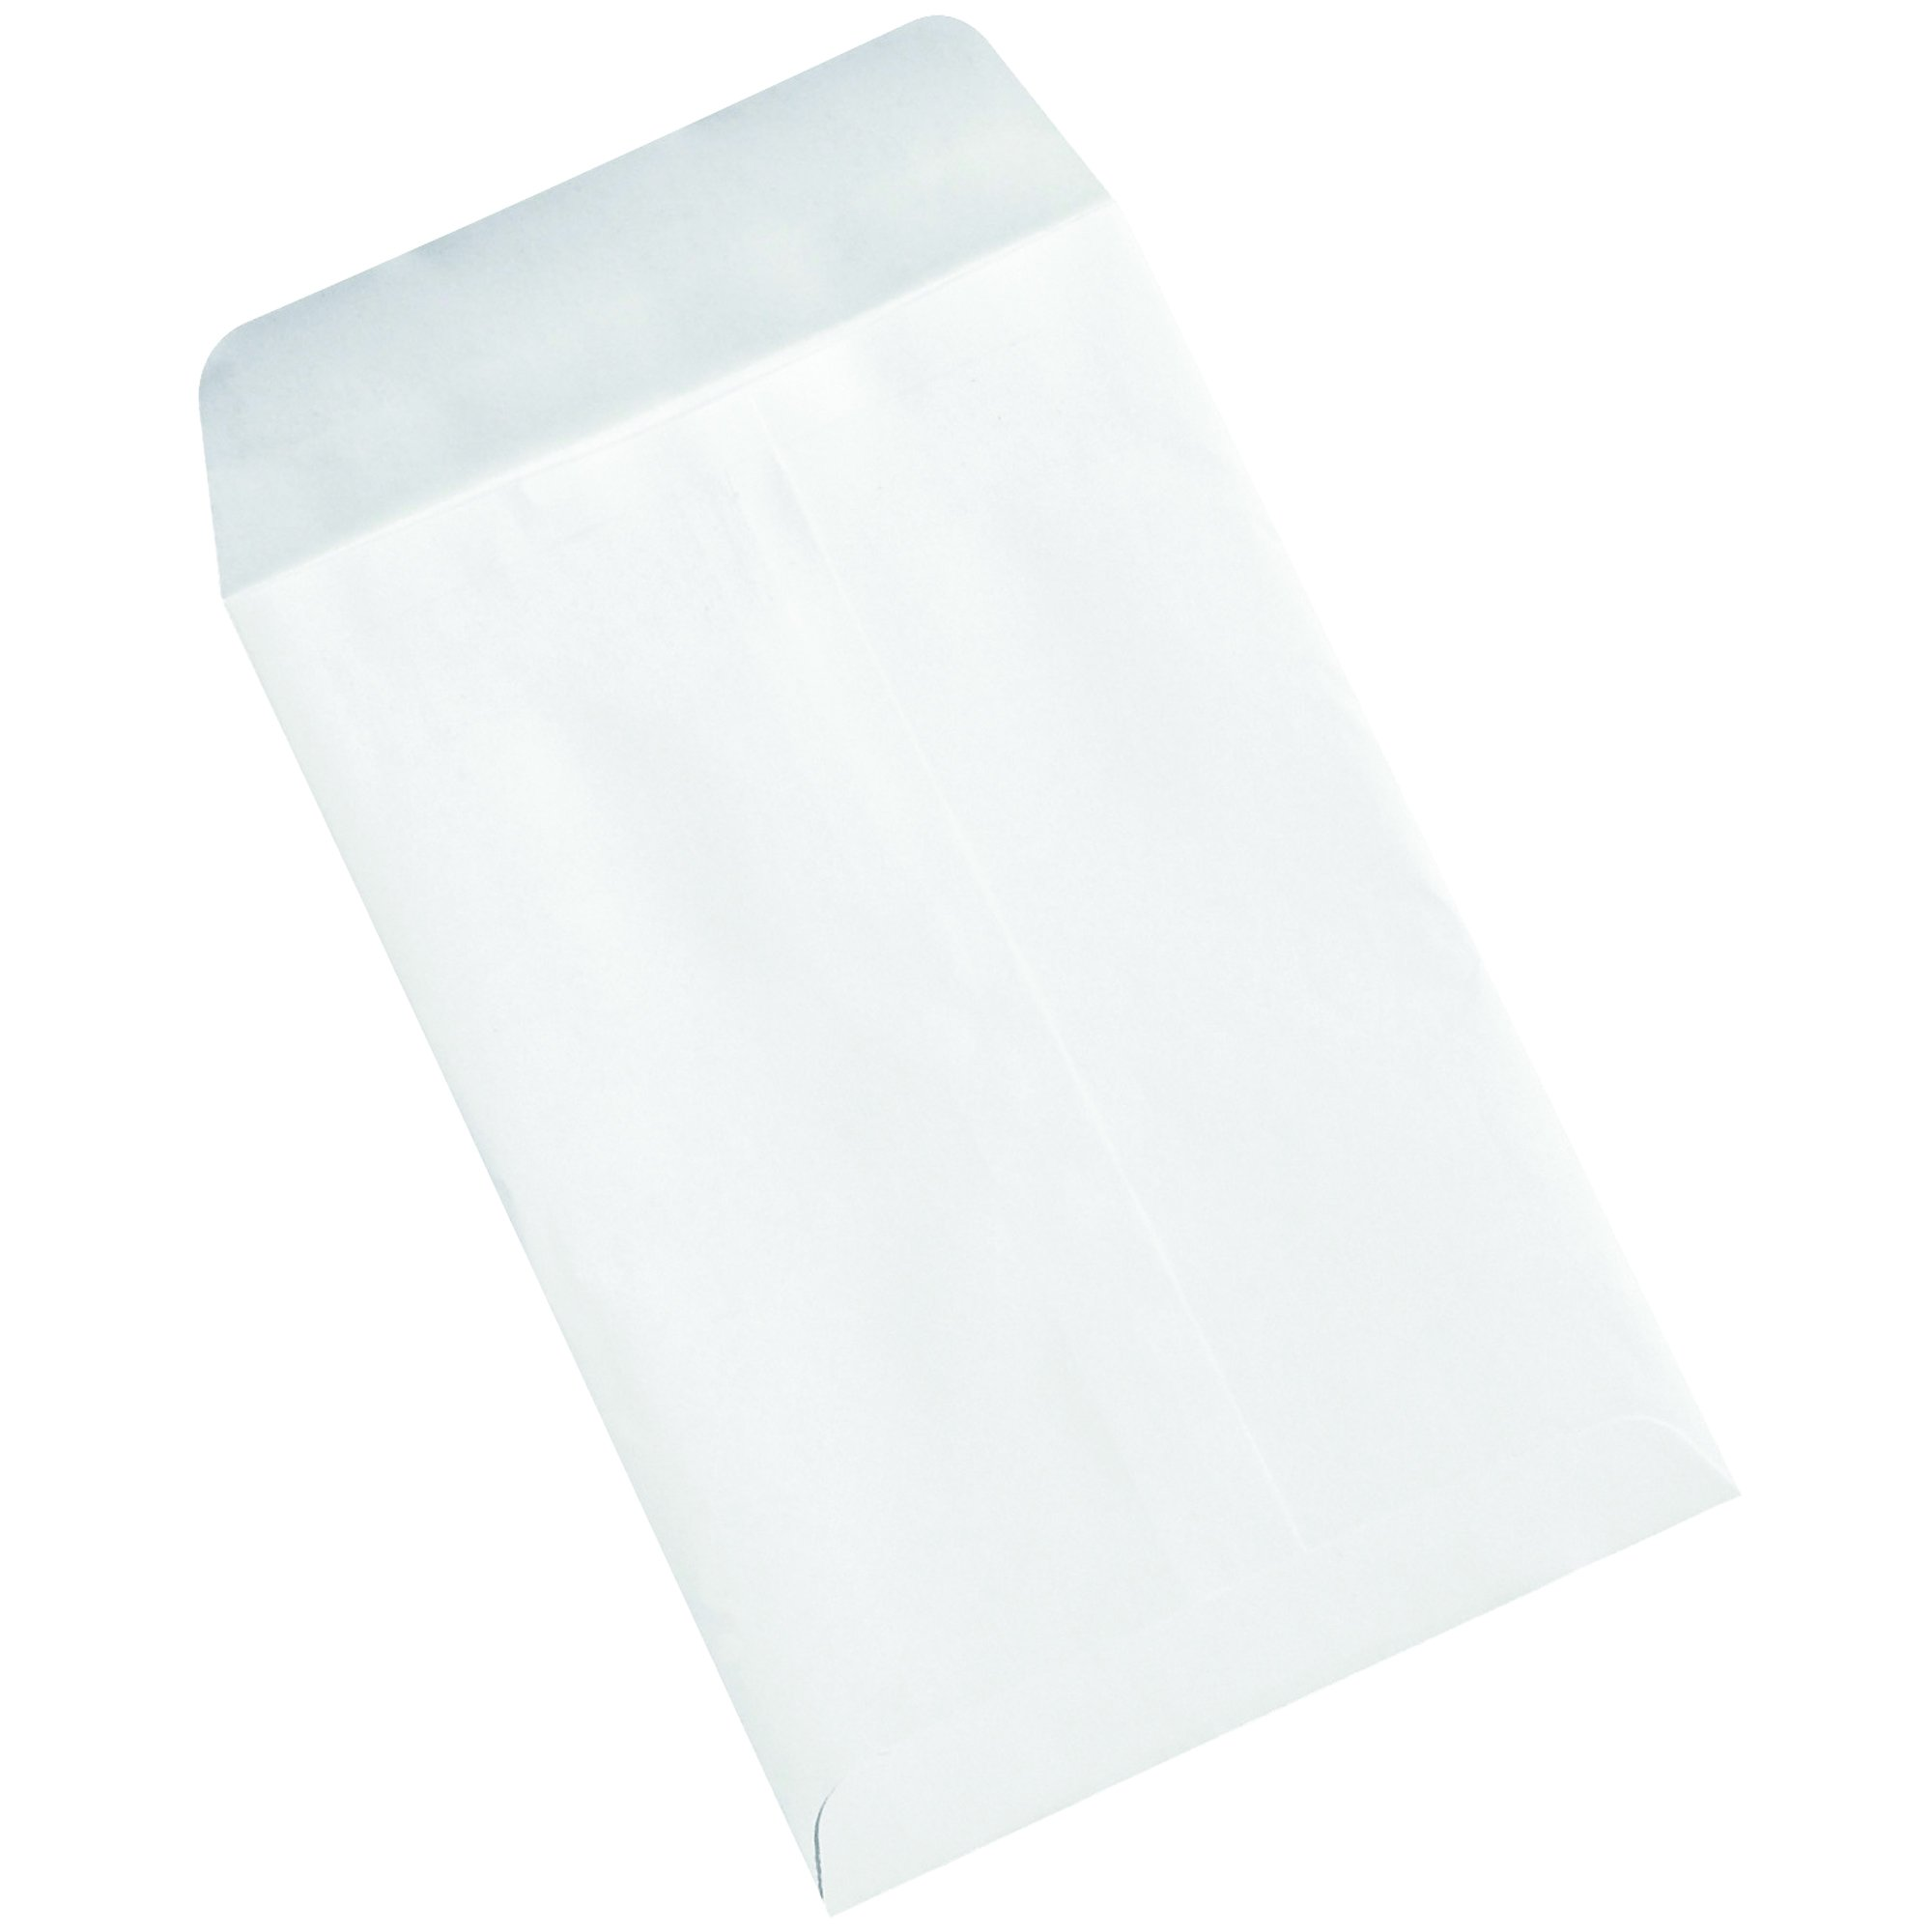 BOX USA BEN1056 Redi-Seal Envelopes, 6 1/2'' x 9 1/2'', White (Pack of 1000)